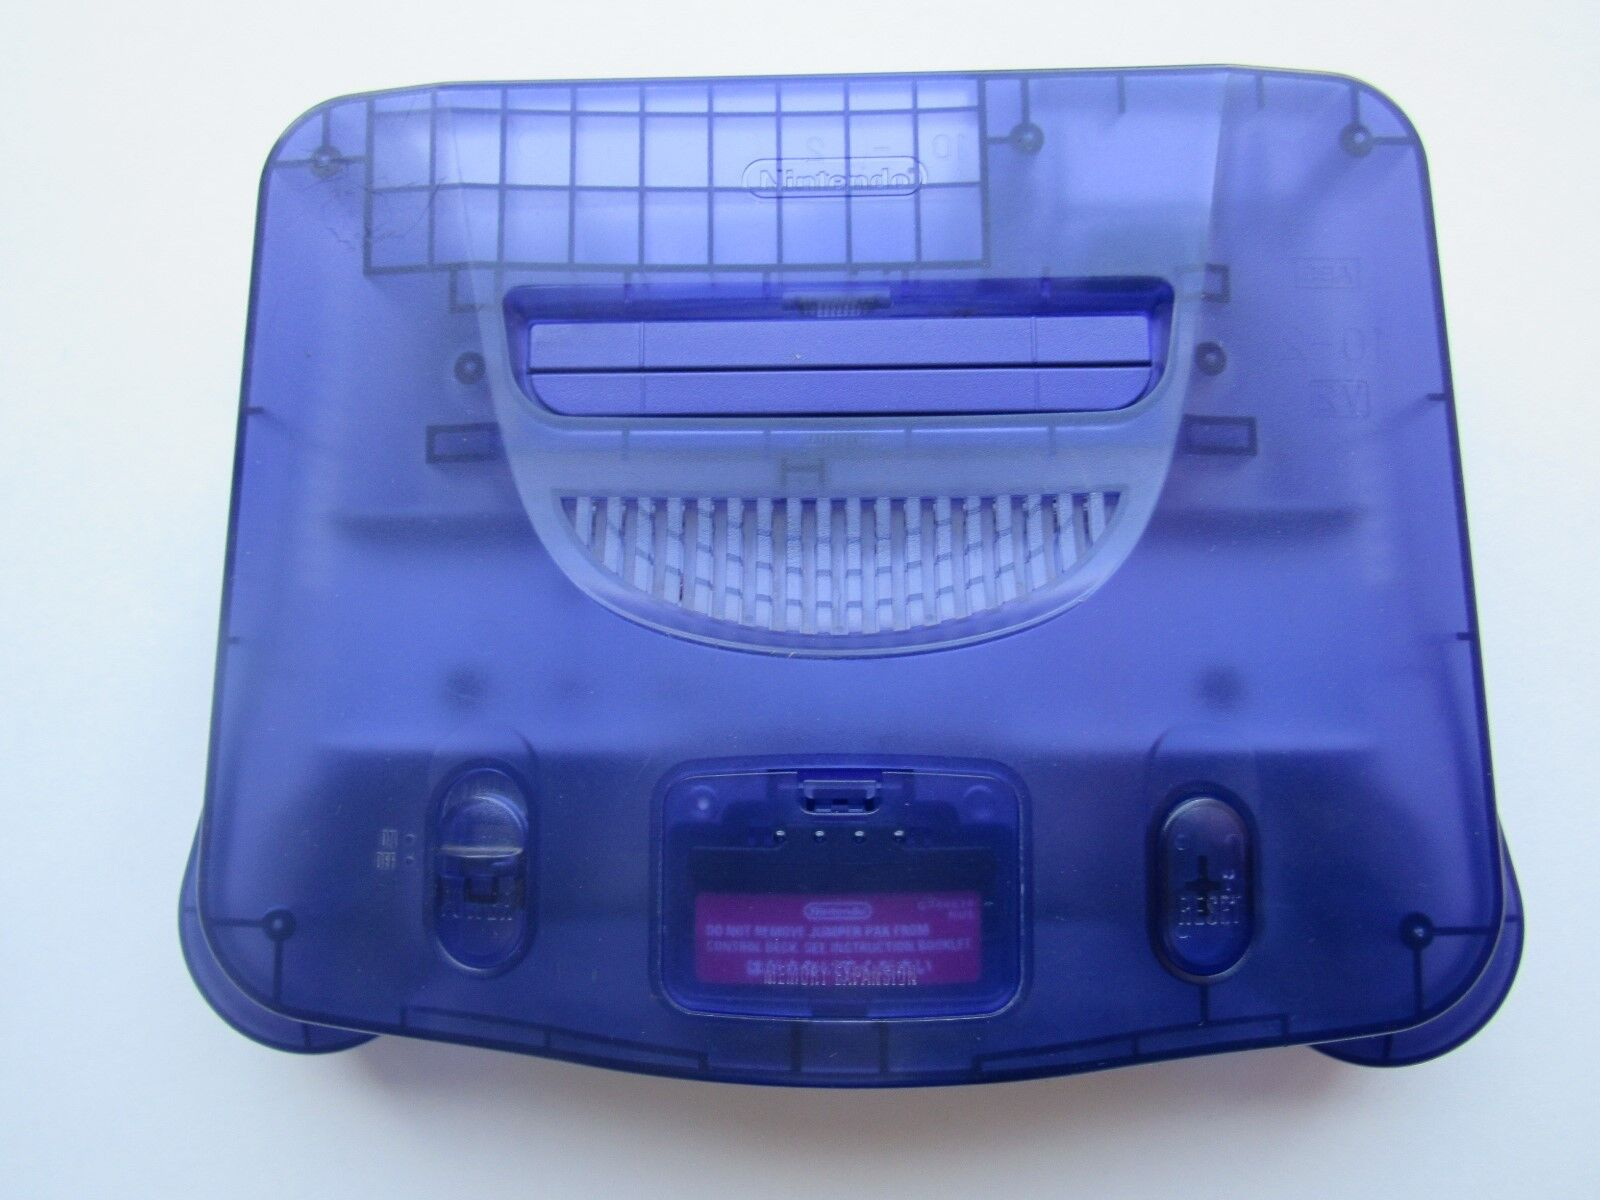 *GOOD* Nintendo 64 N64 Video Game Console Selection Funtastic Pokemon Gold PICK! Grape Purple *Console & Jumper Pack